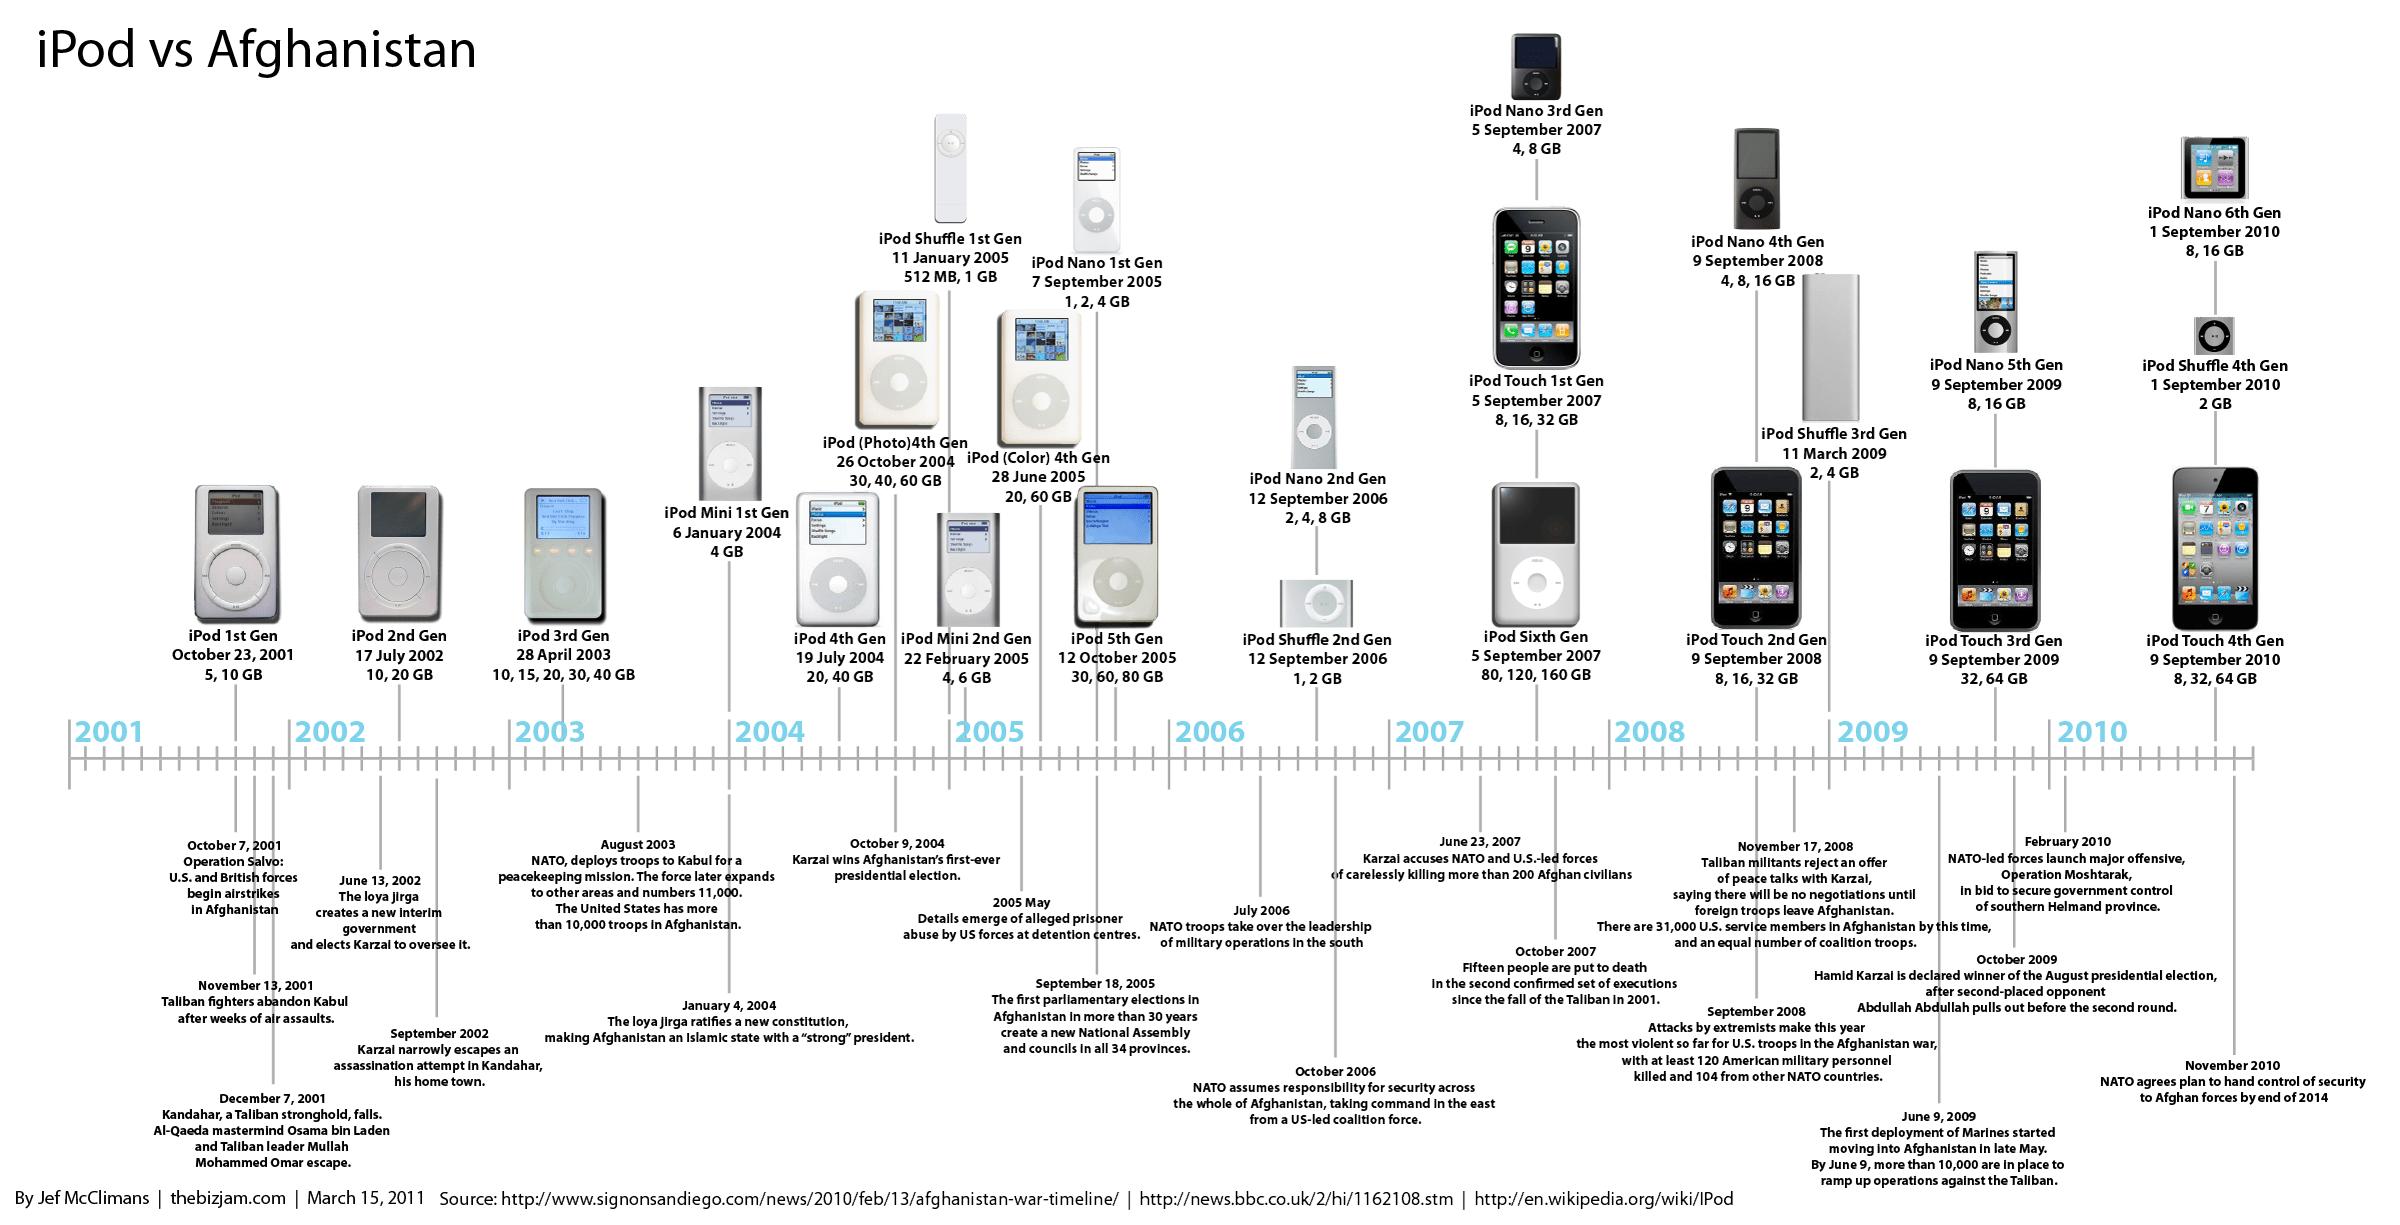 iPod Versus Afghanistan [INFOGRAPHIC]